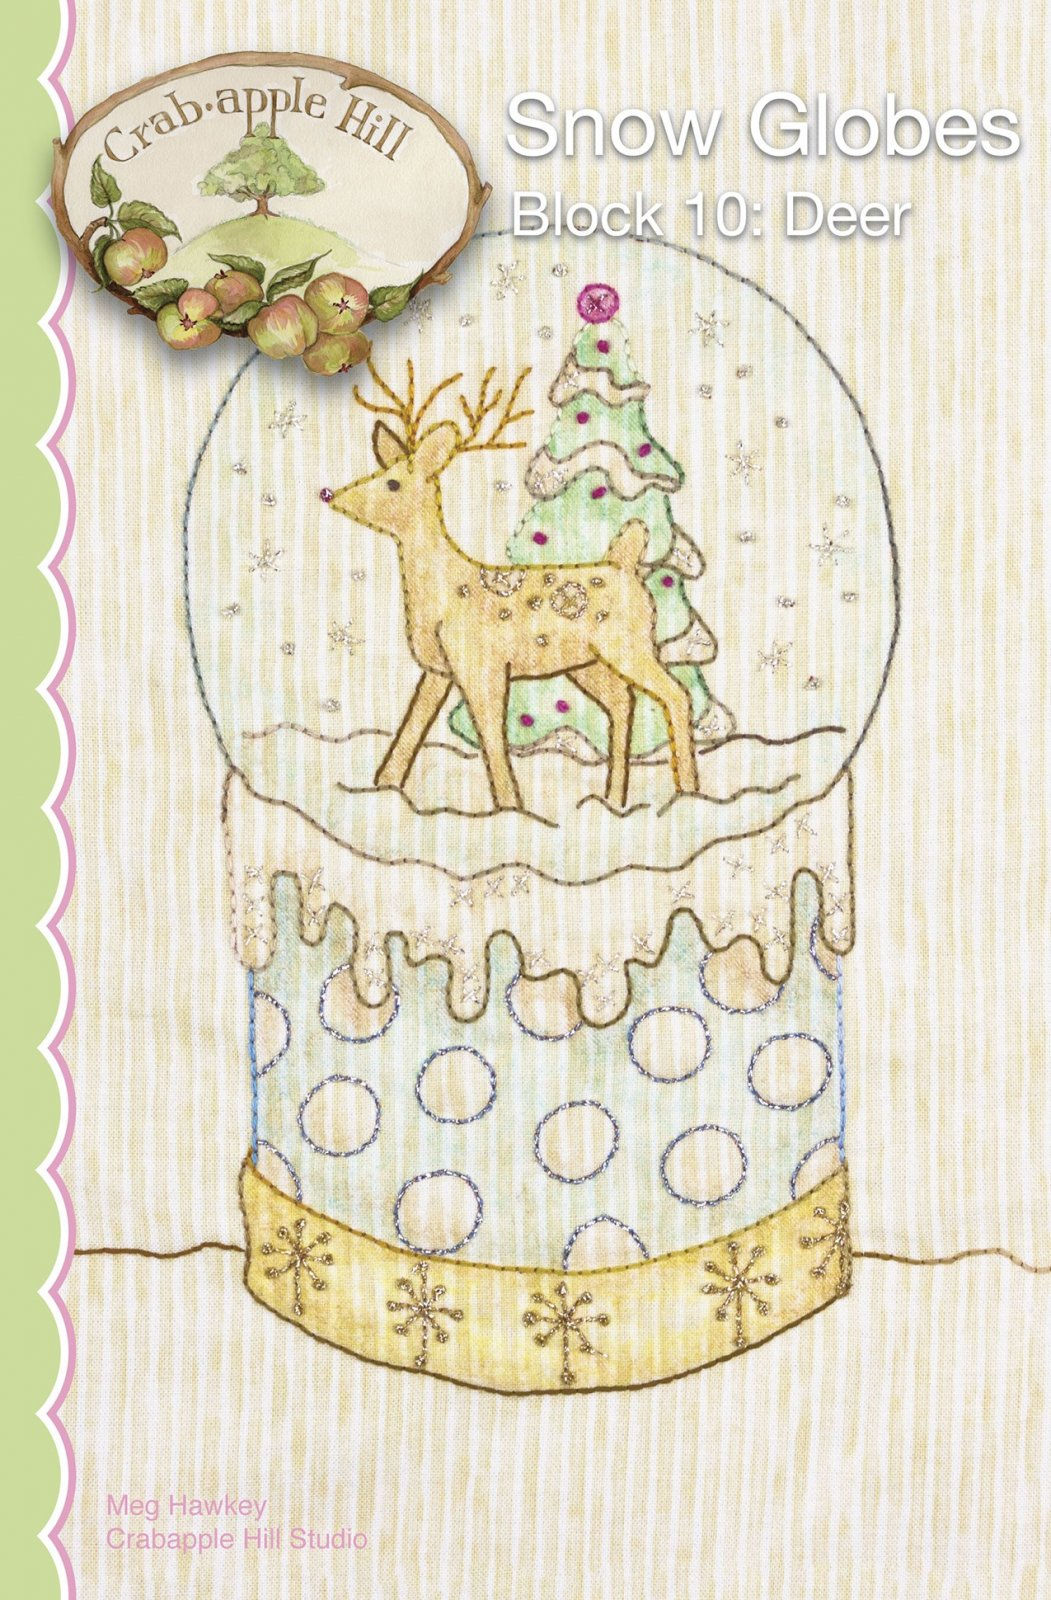 Snow Globes -10 - Deer